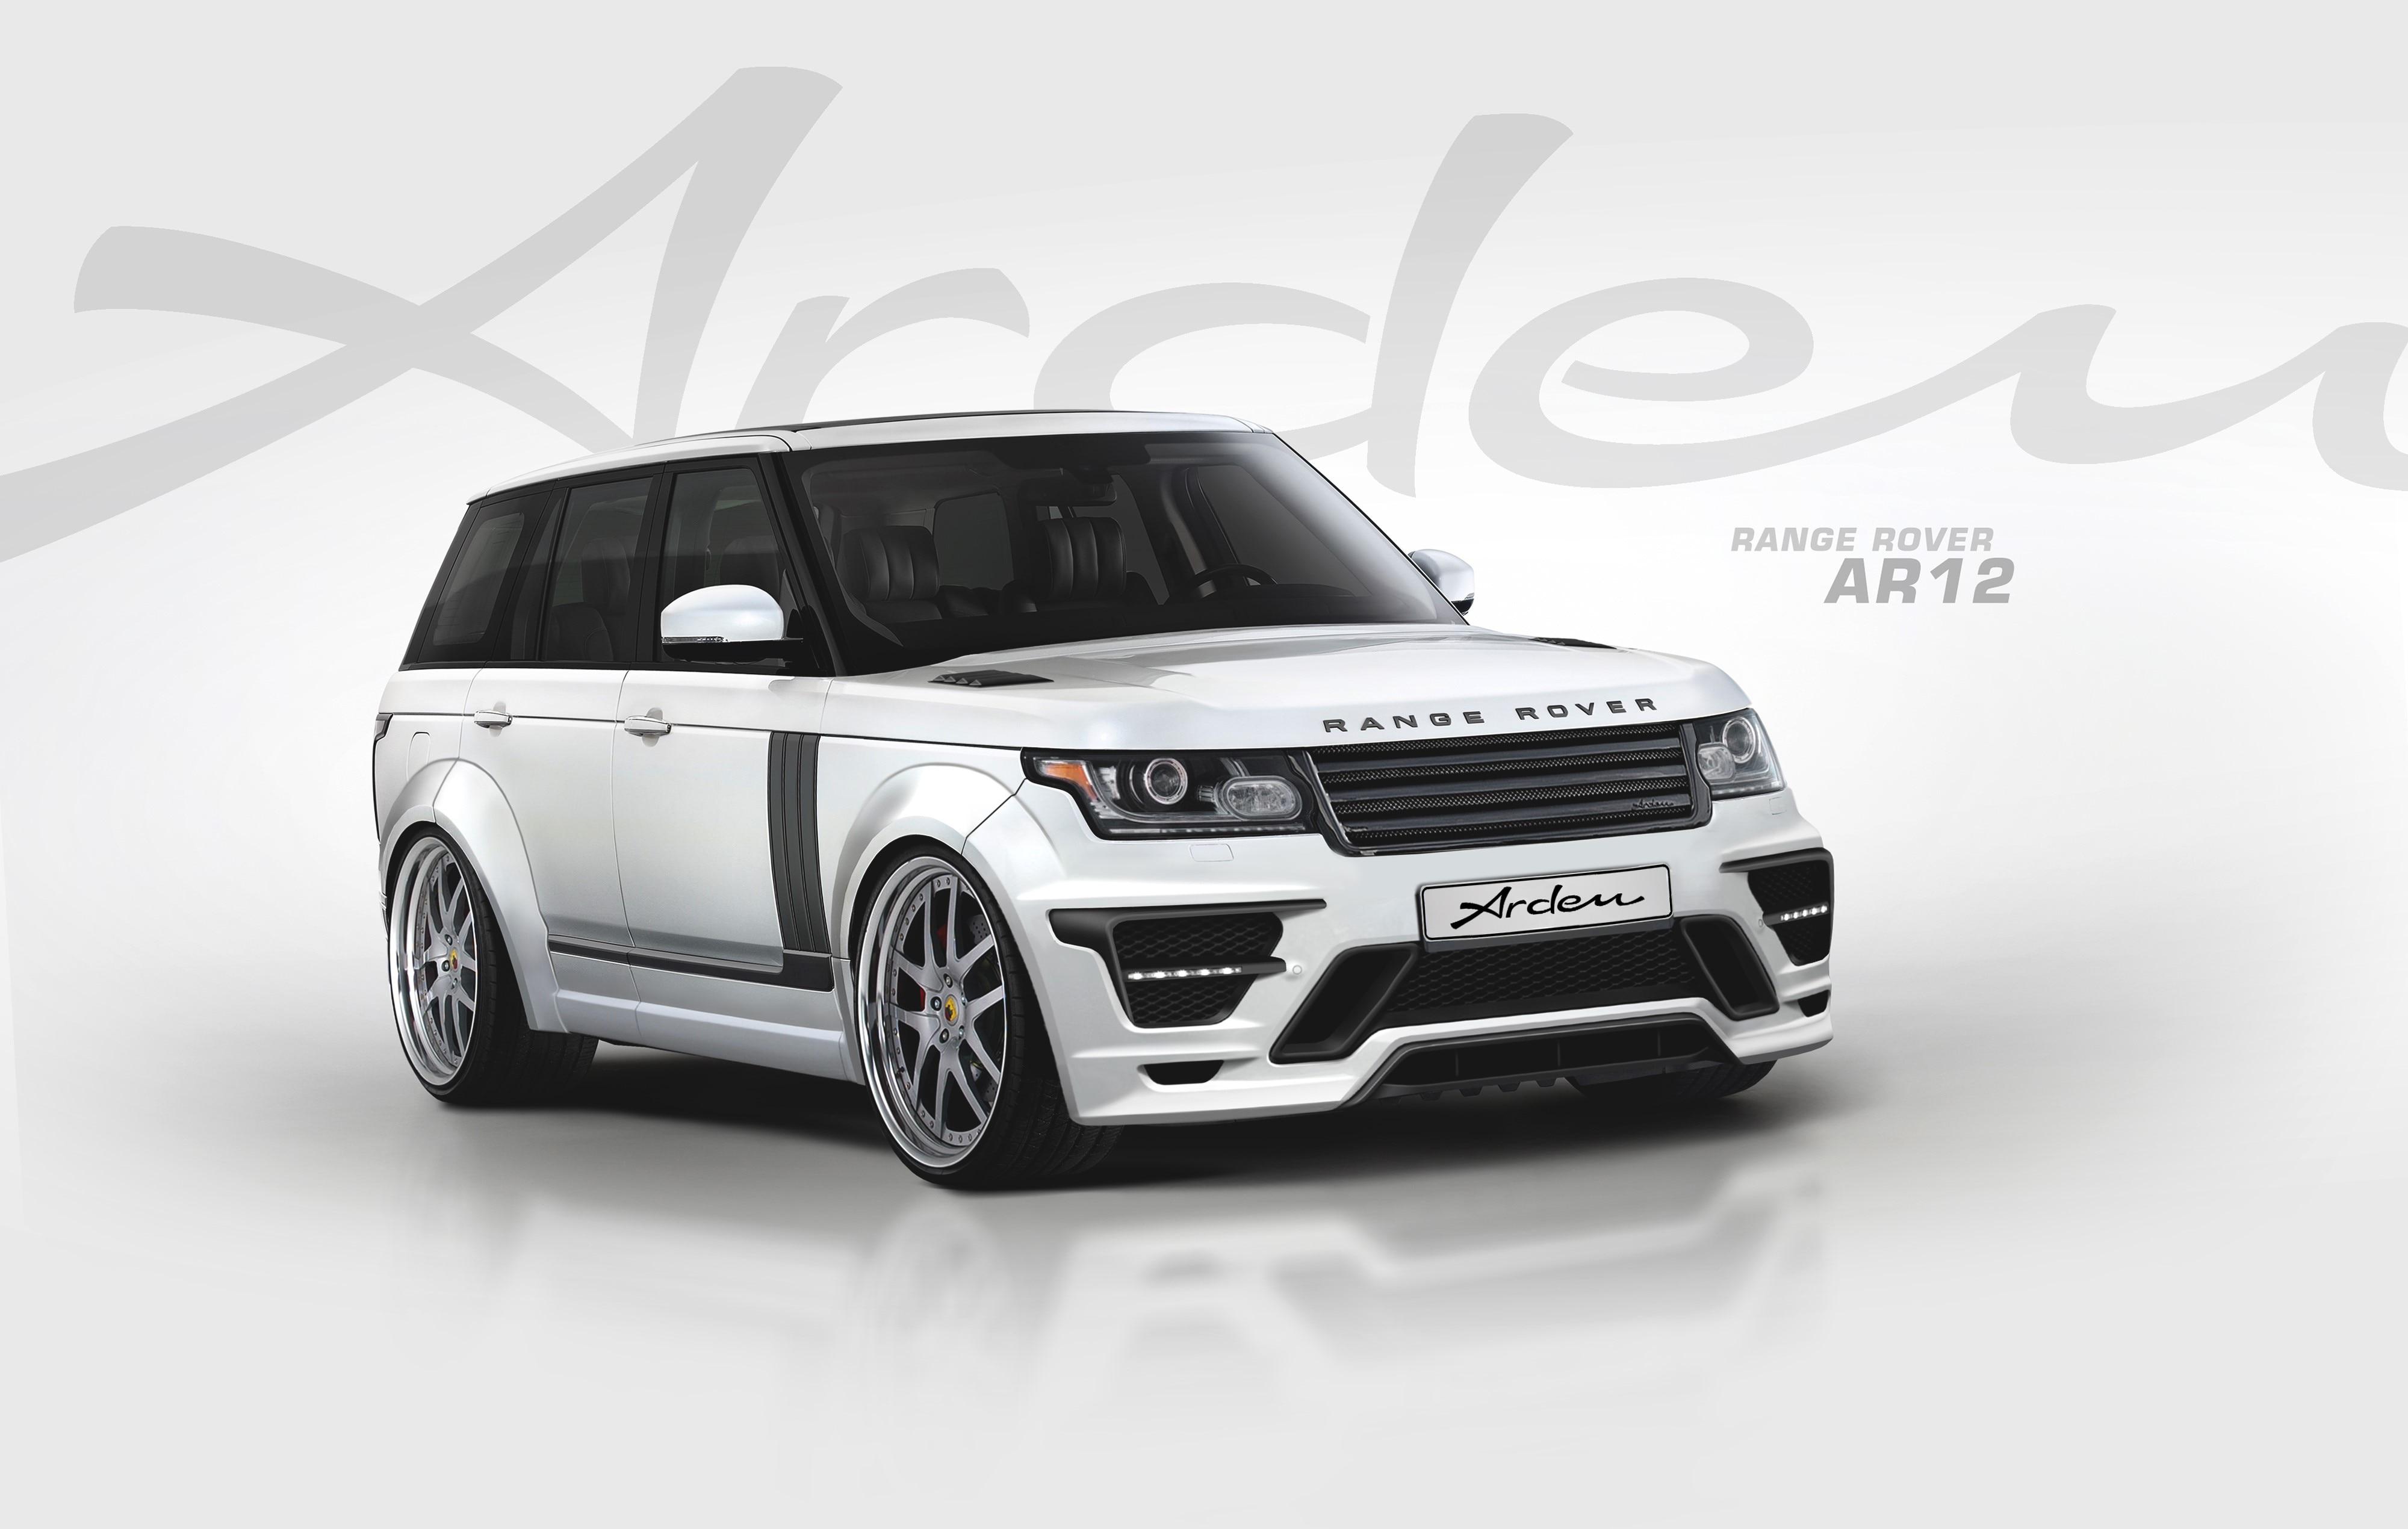 Arden Range Rover AR 12